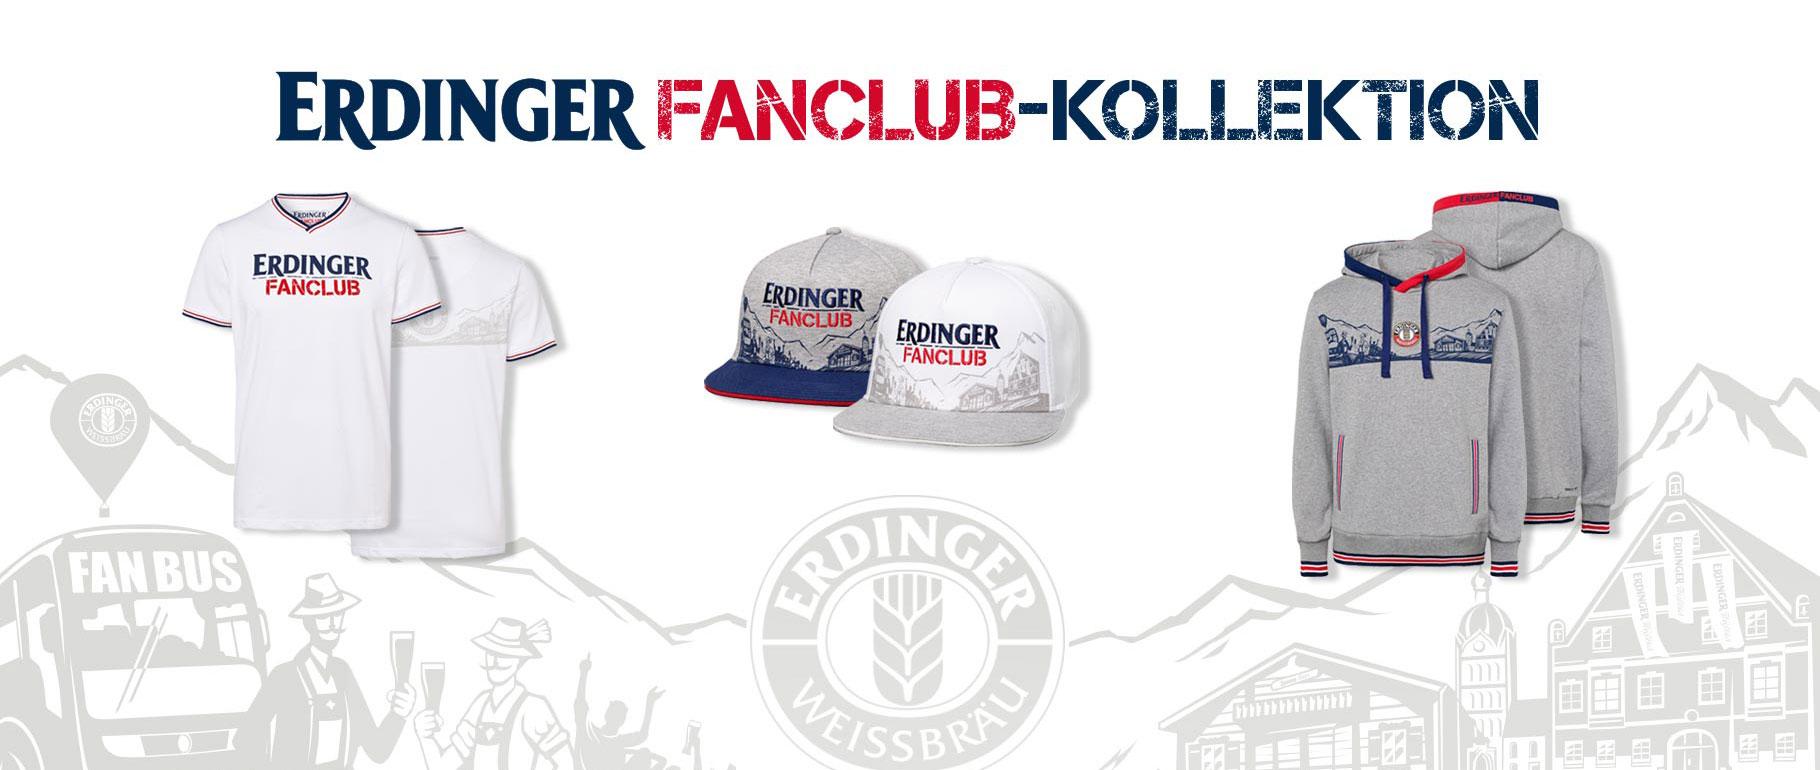 Die ERDINGER Fanclub-Kollektion